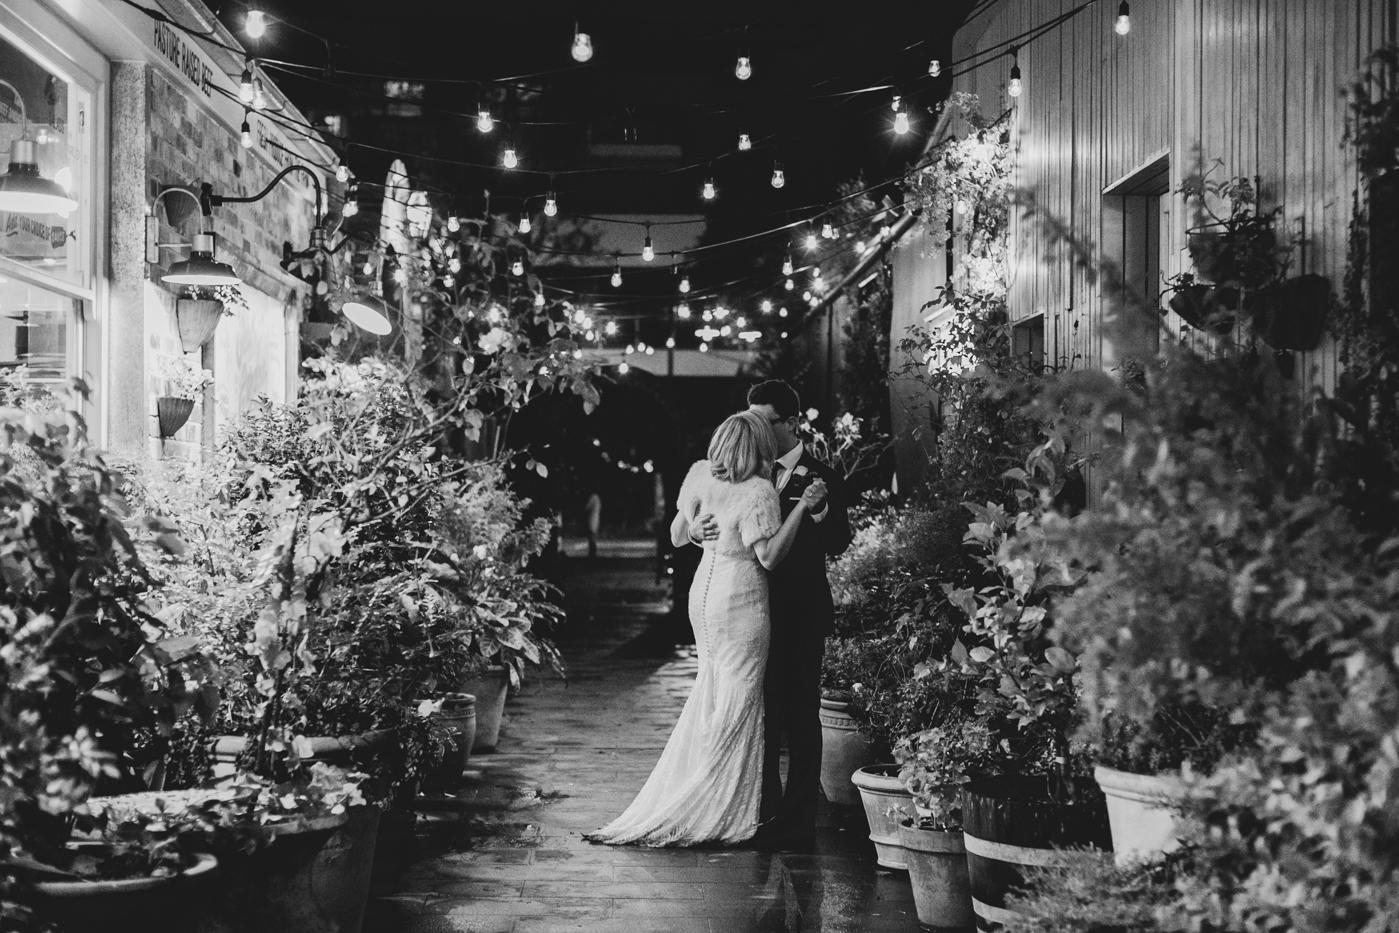 Jo & Tom Wedding - The Grounds of Alexandria - Samantha Heather Photography-331.jpg